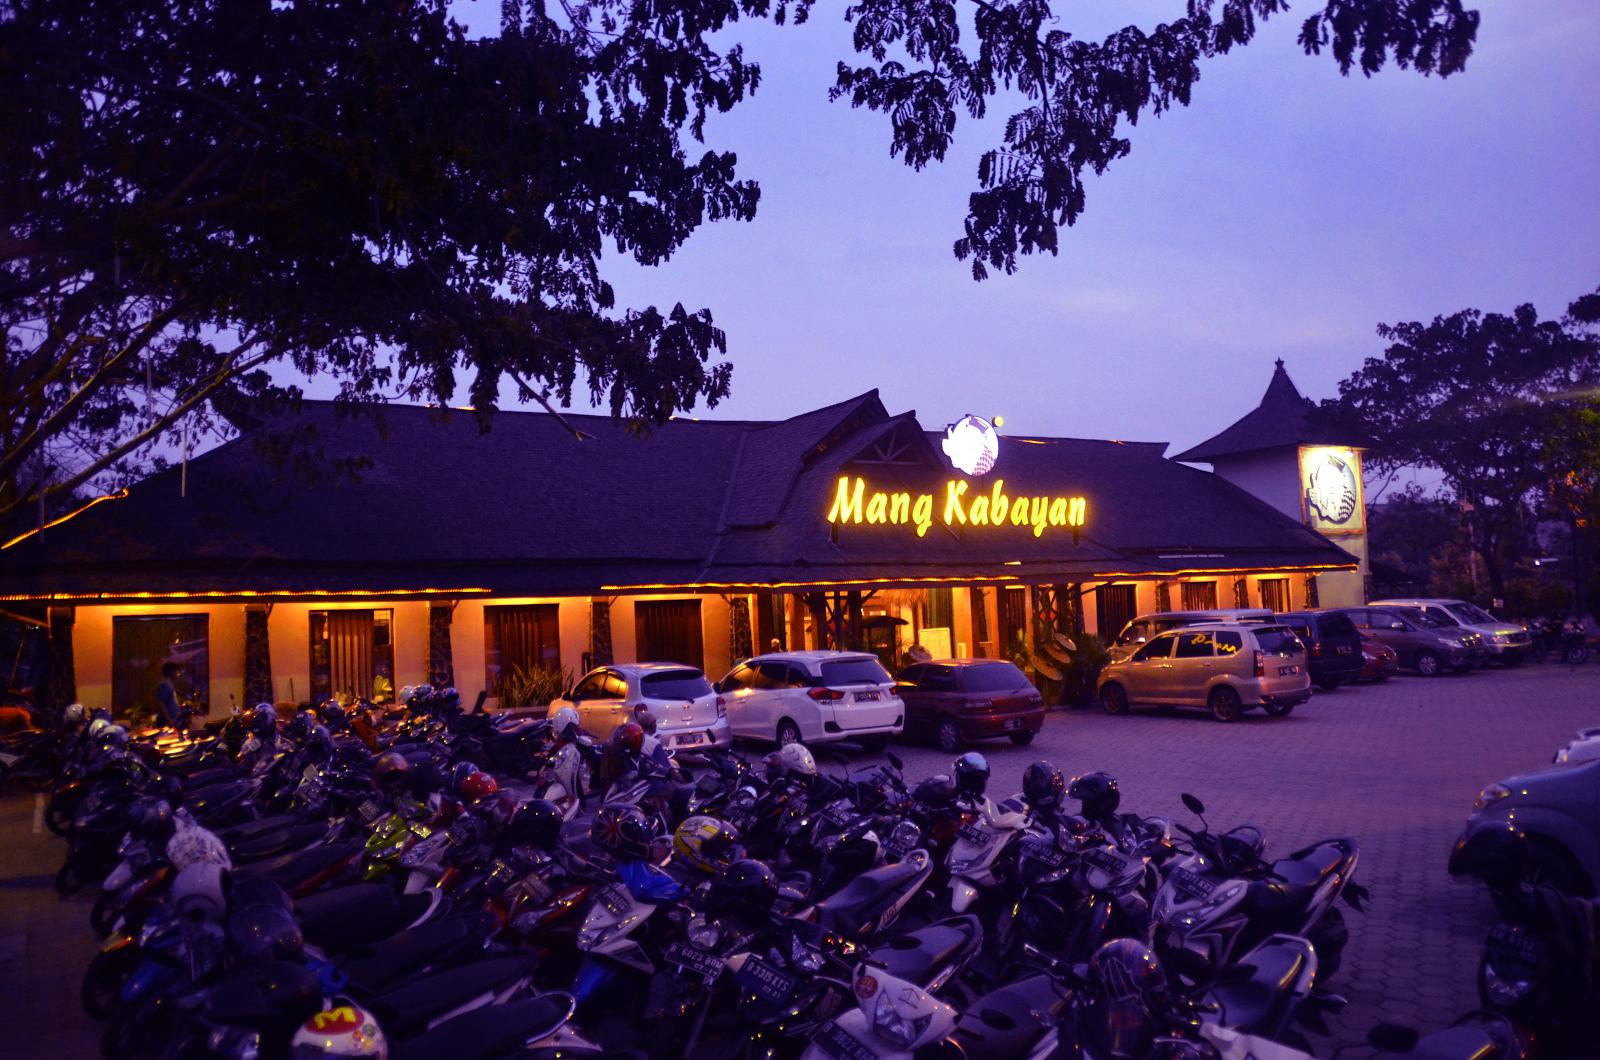 http://mangkabayan68.blogspot.co.id/2016/06/bekasi.html